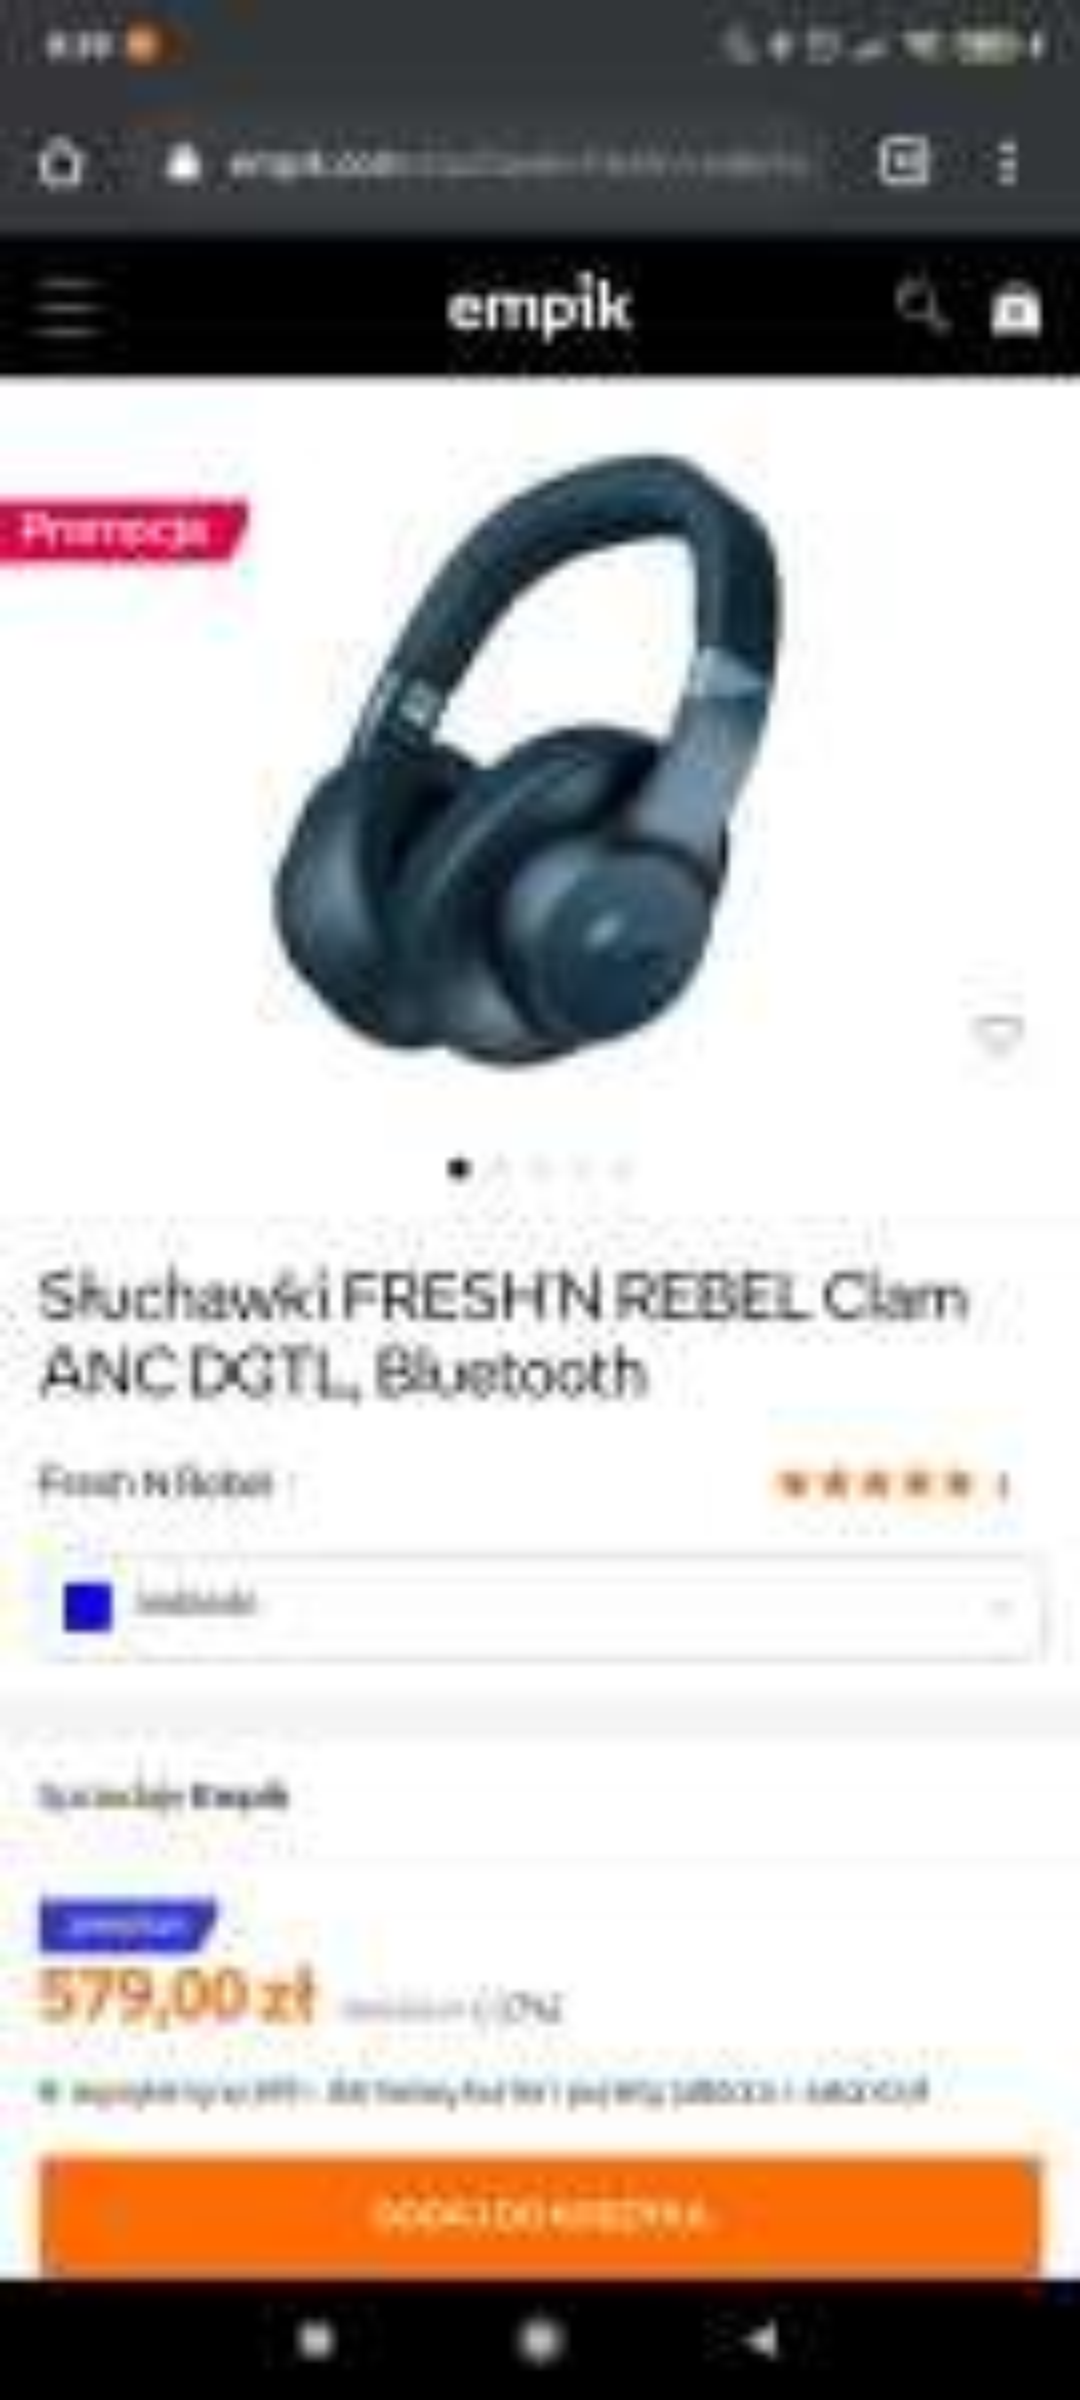 Słuchawki FRESH'N REBEL Clam ANC DGTL, Bluetooth, Empik